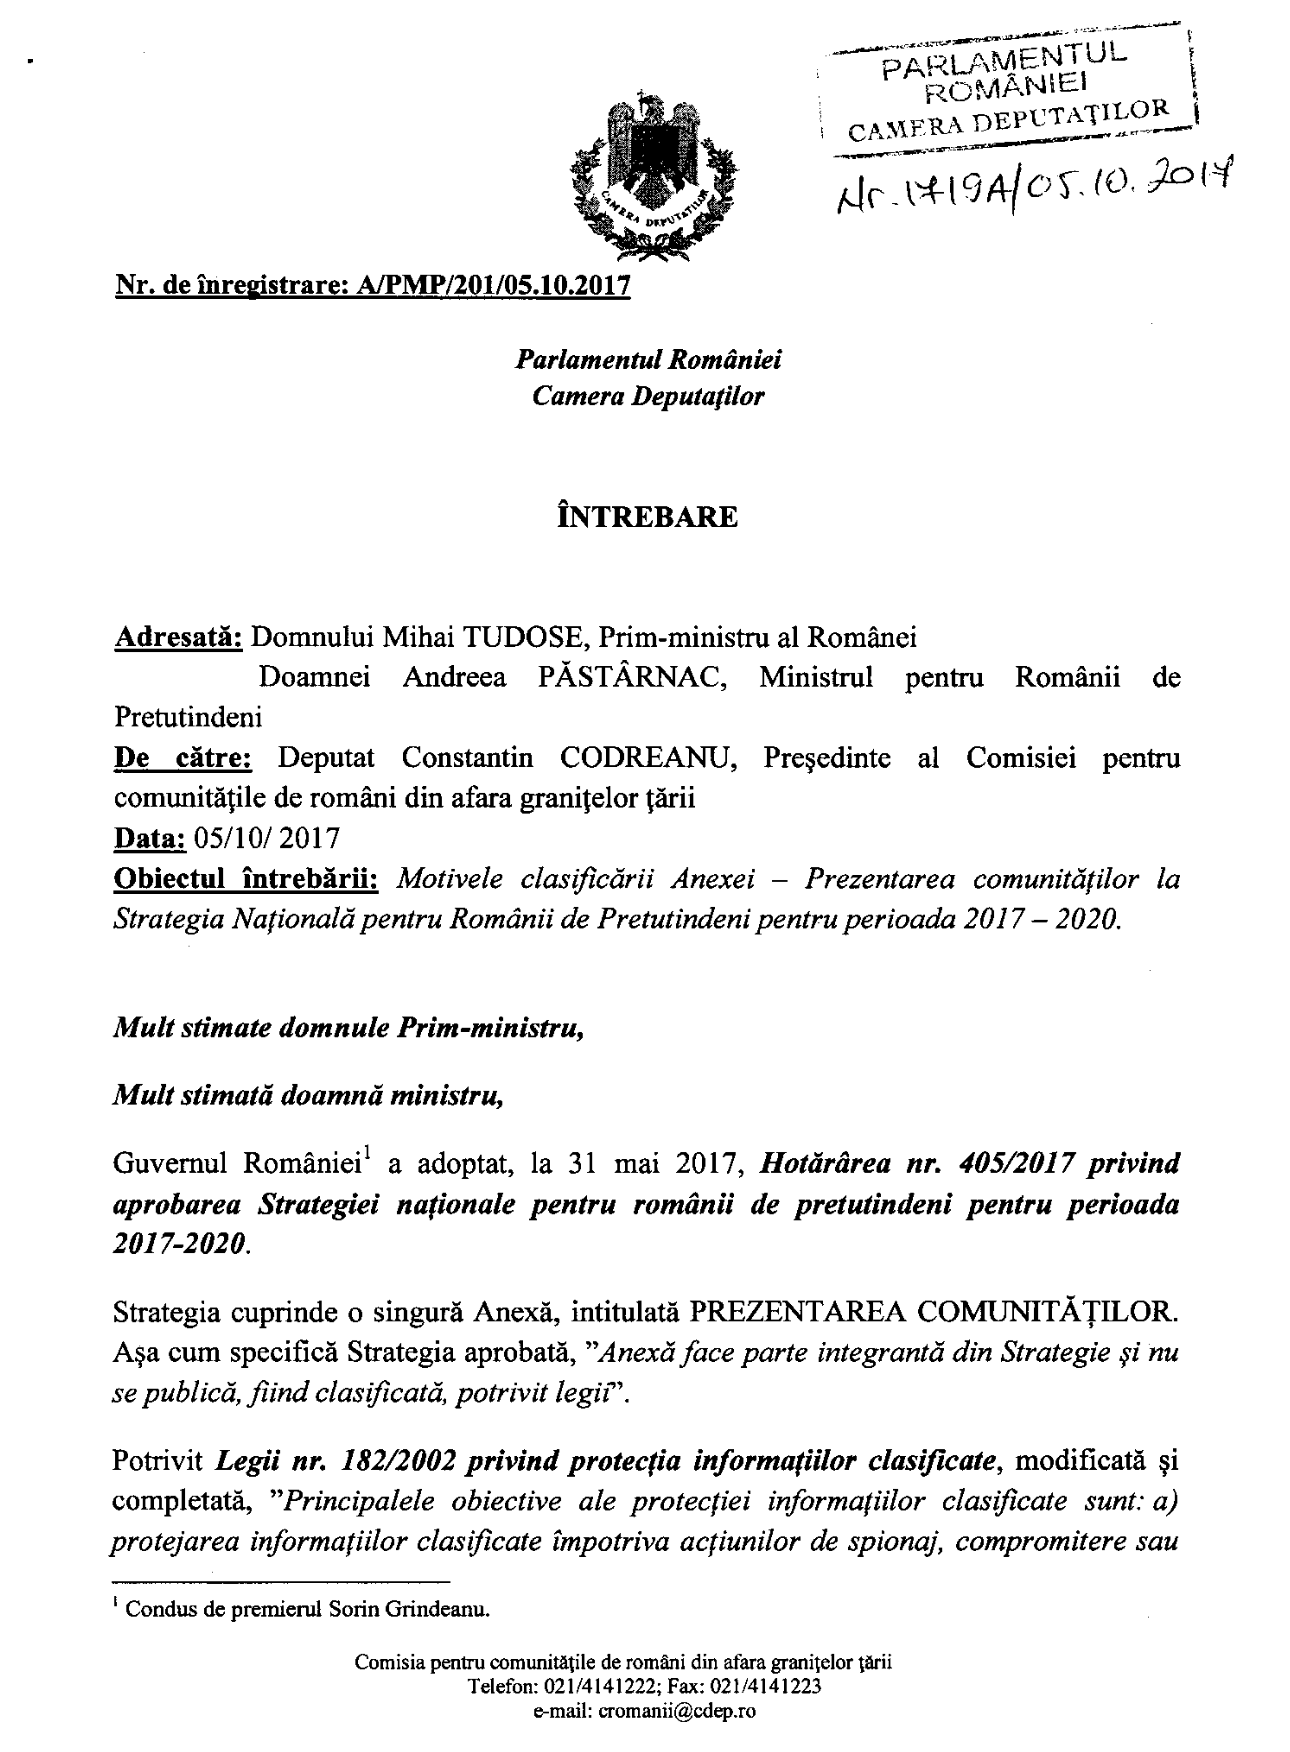 Interpelare Constantin Codreanu